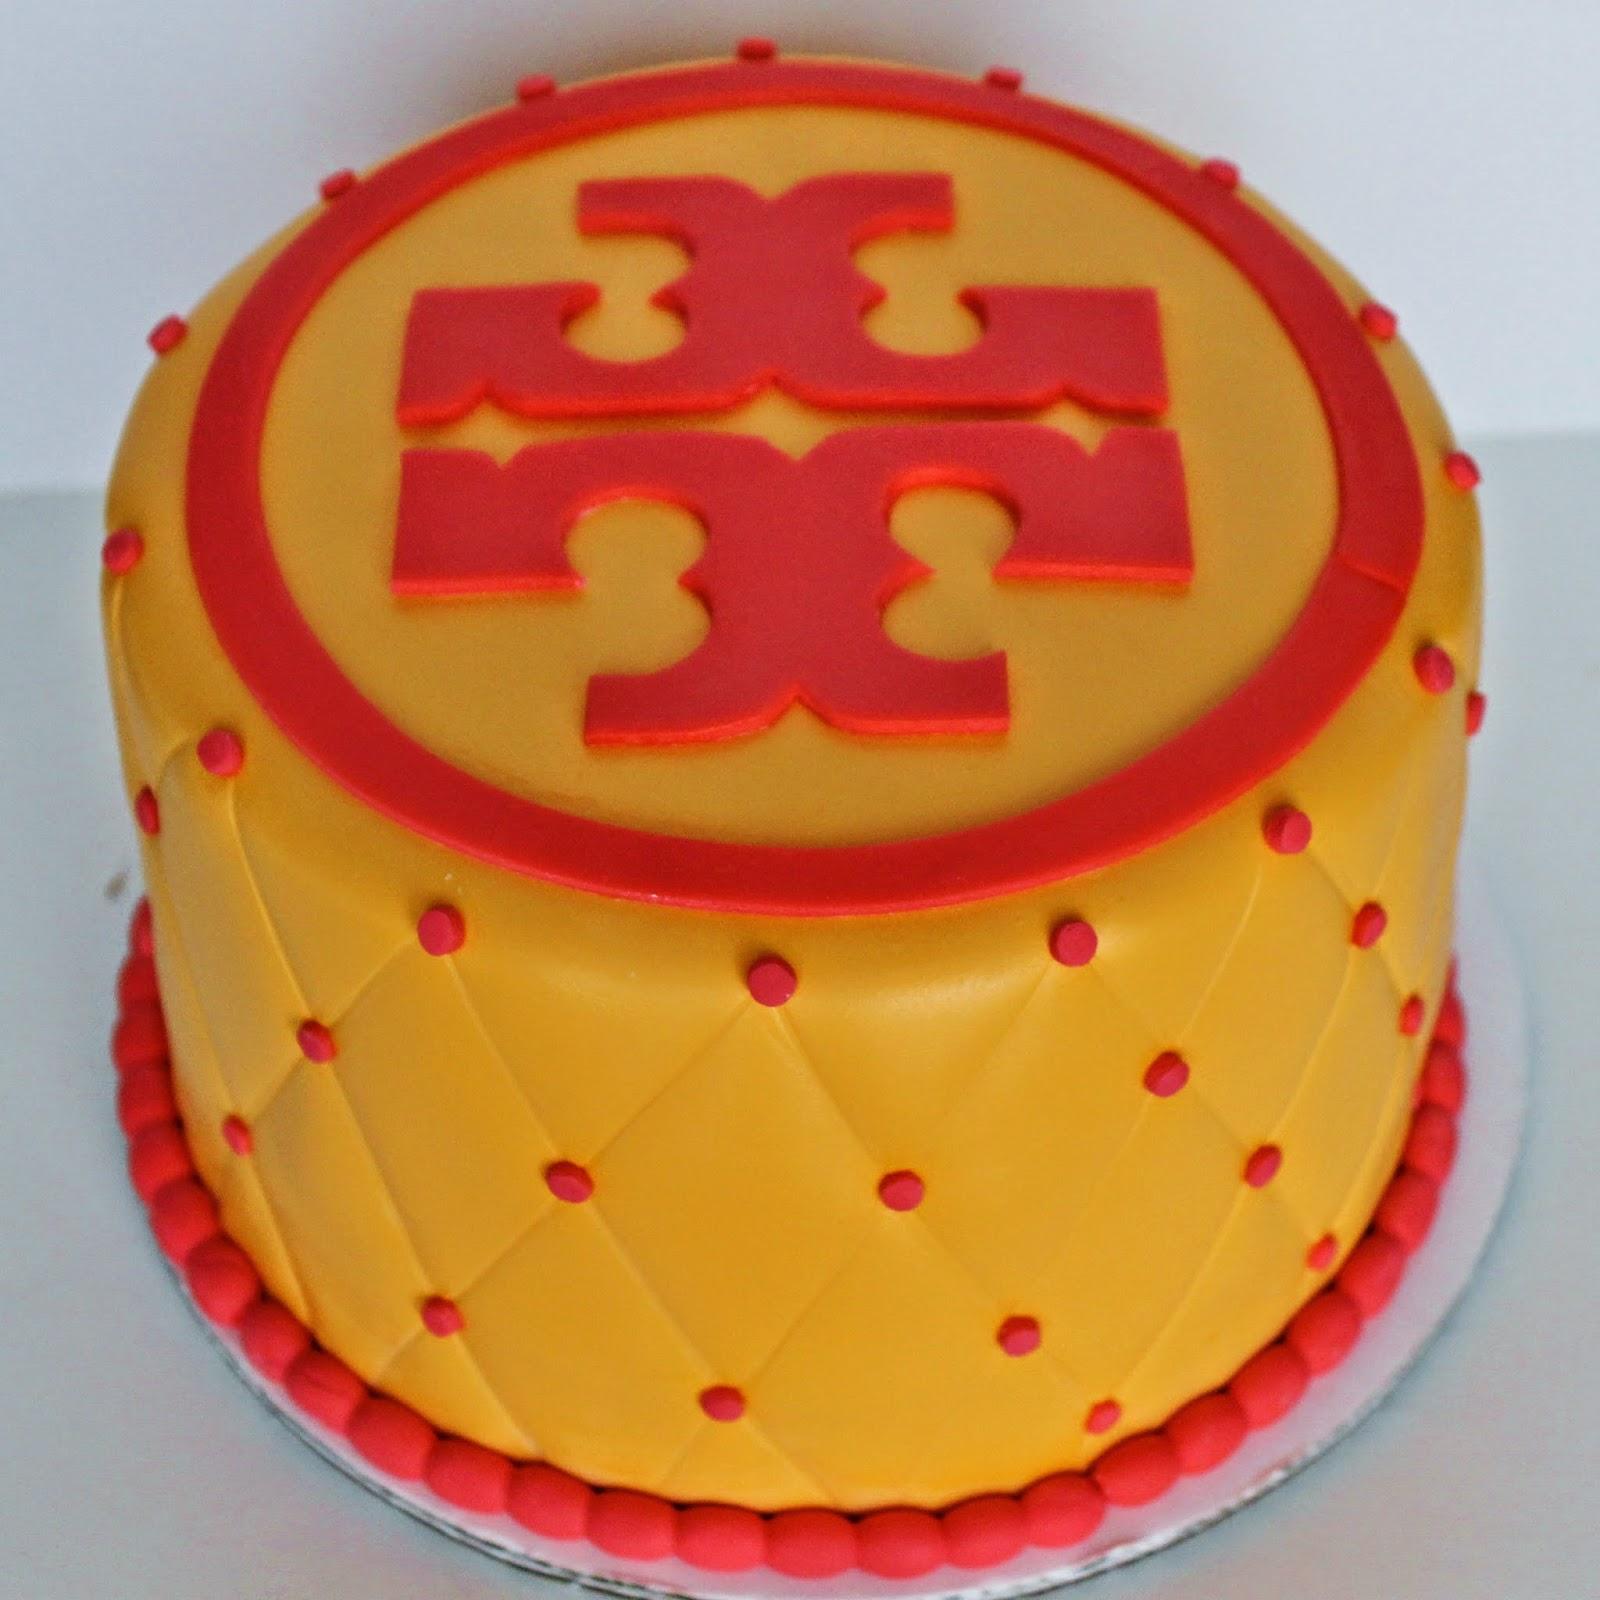 tory burch cake